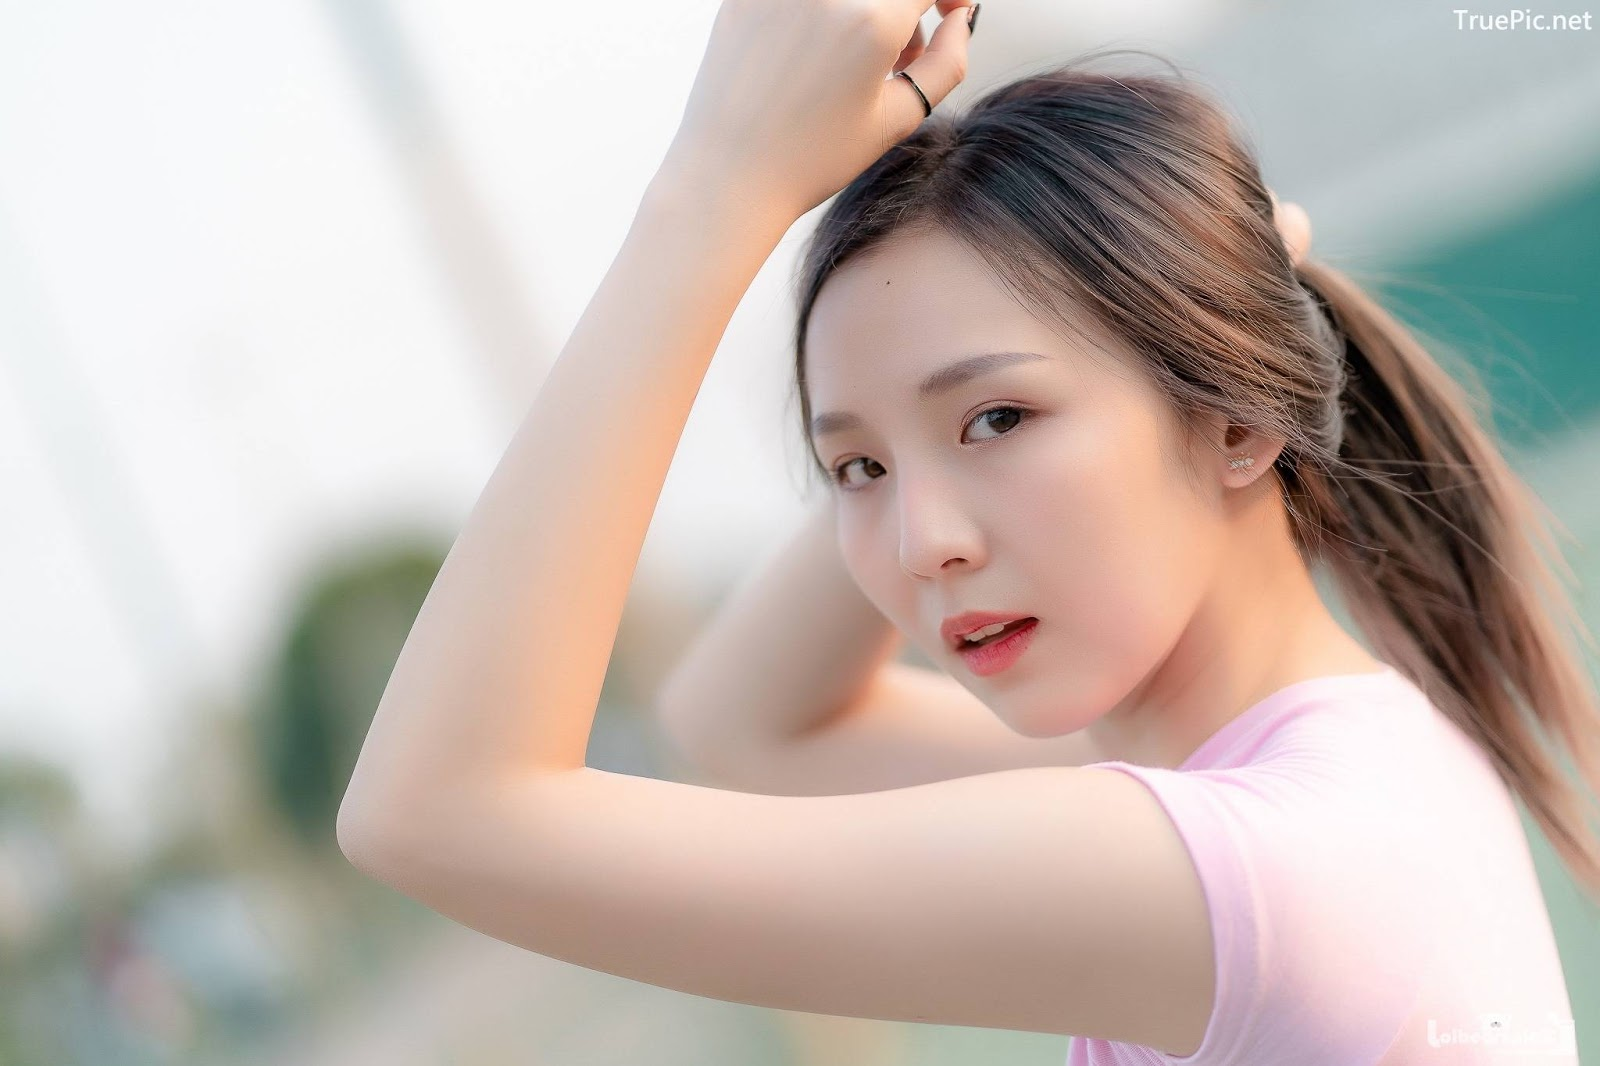 Image Thailand Model - Pattanan Truengjitrarat - Cute Sports Girl - TruePic.net - Picture-2